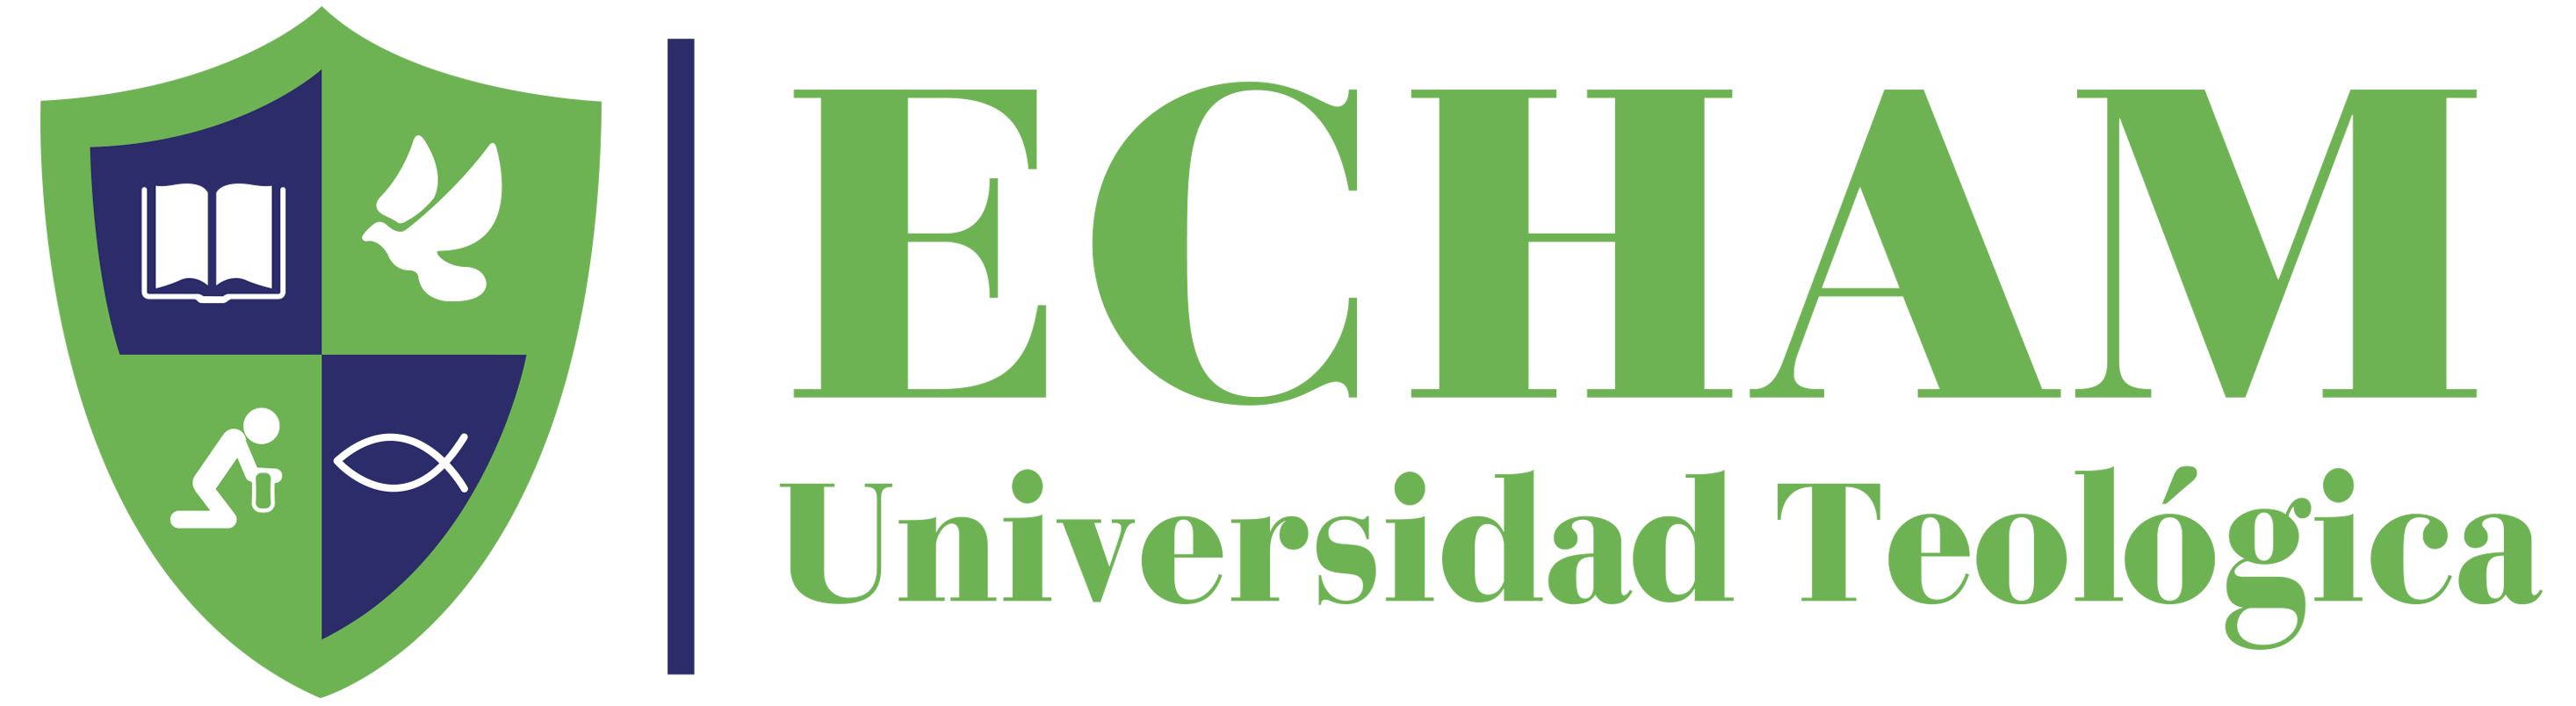 Universidad Teológica ECHAM